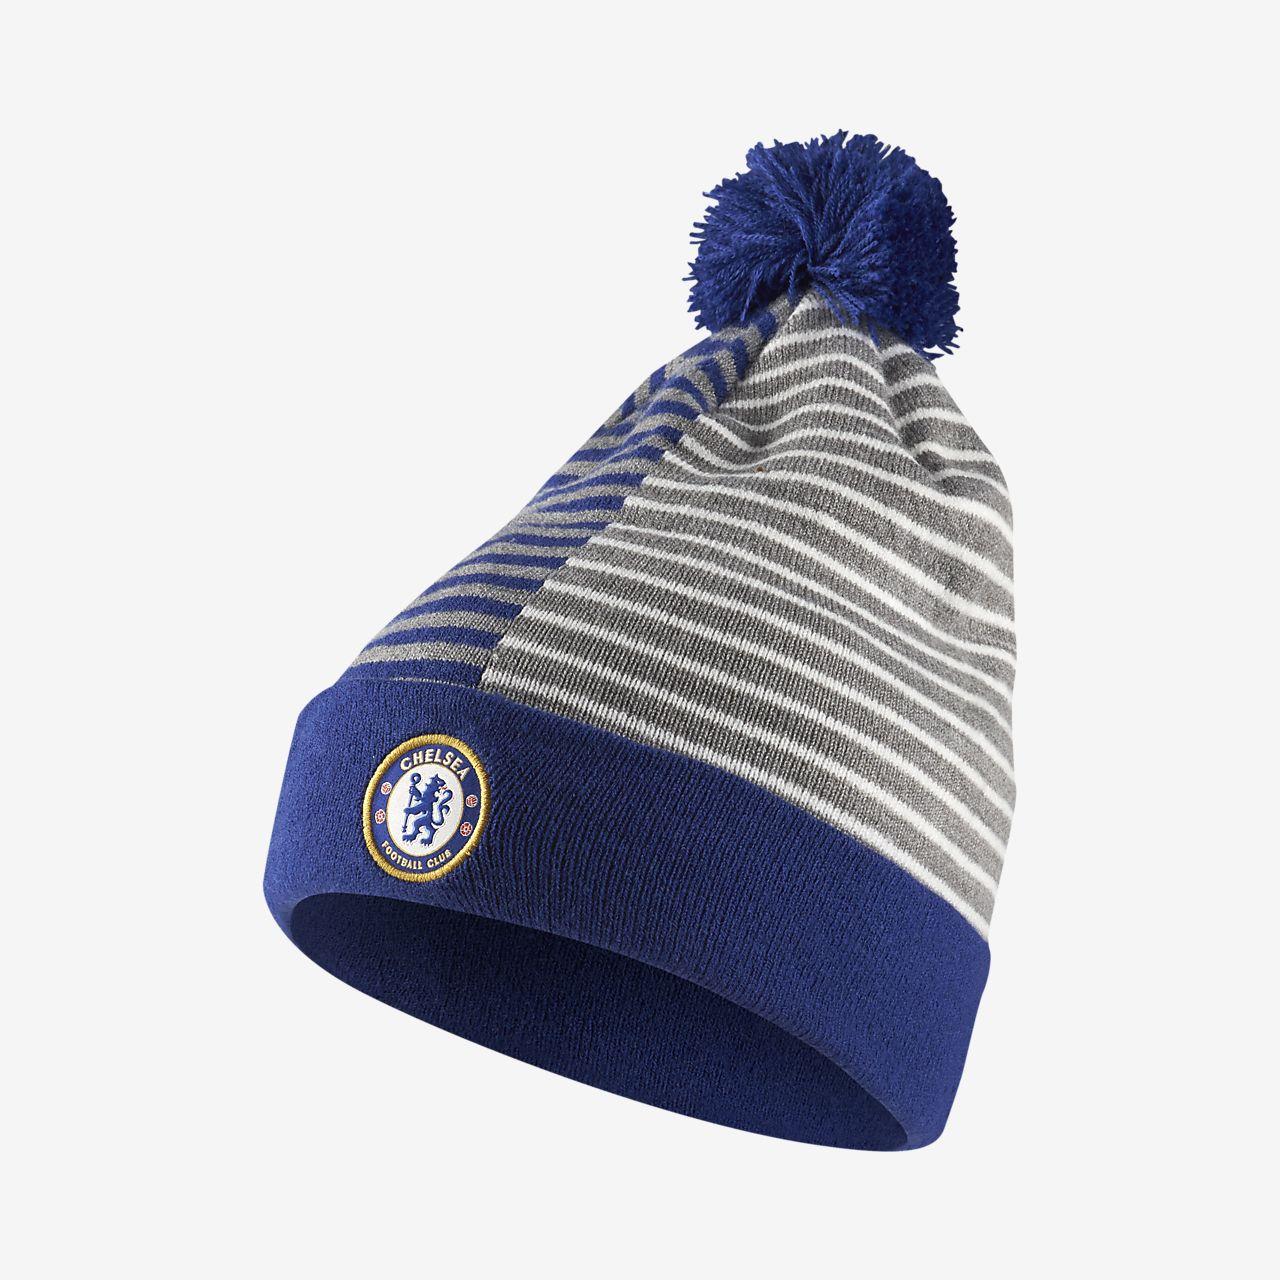 5c7e6da3f5c Chelsea FC Beanie. Nike.com NZ